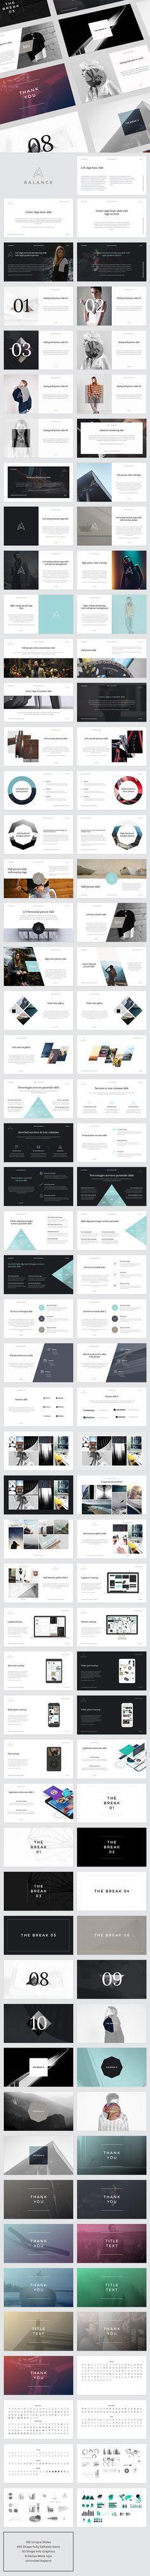 BALANCE PowerPoint Presentation Template #design #slides Download: http://graphicriver.net/item/balance-powerpoint-presentation/14417275?ref=ksioks